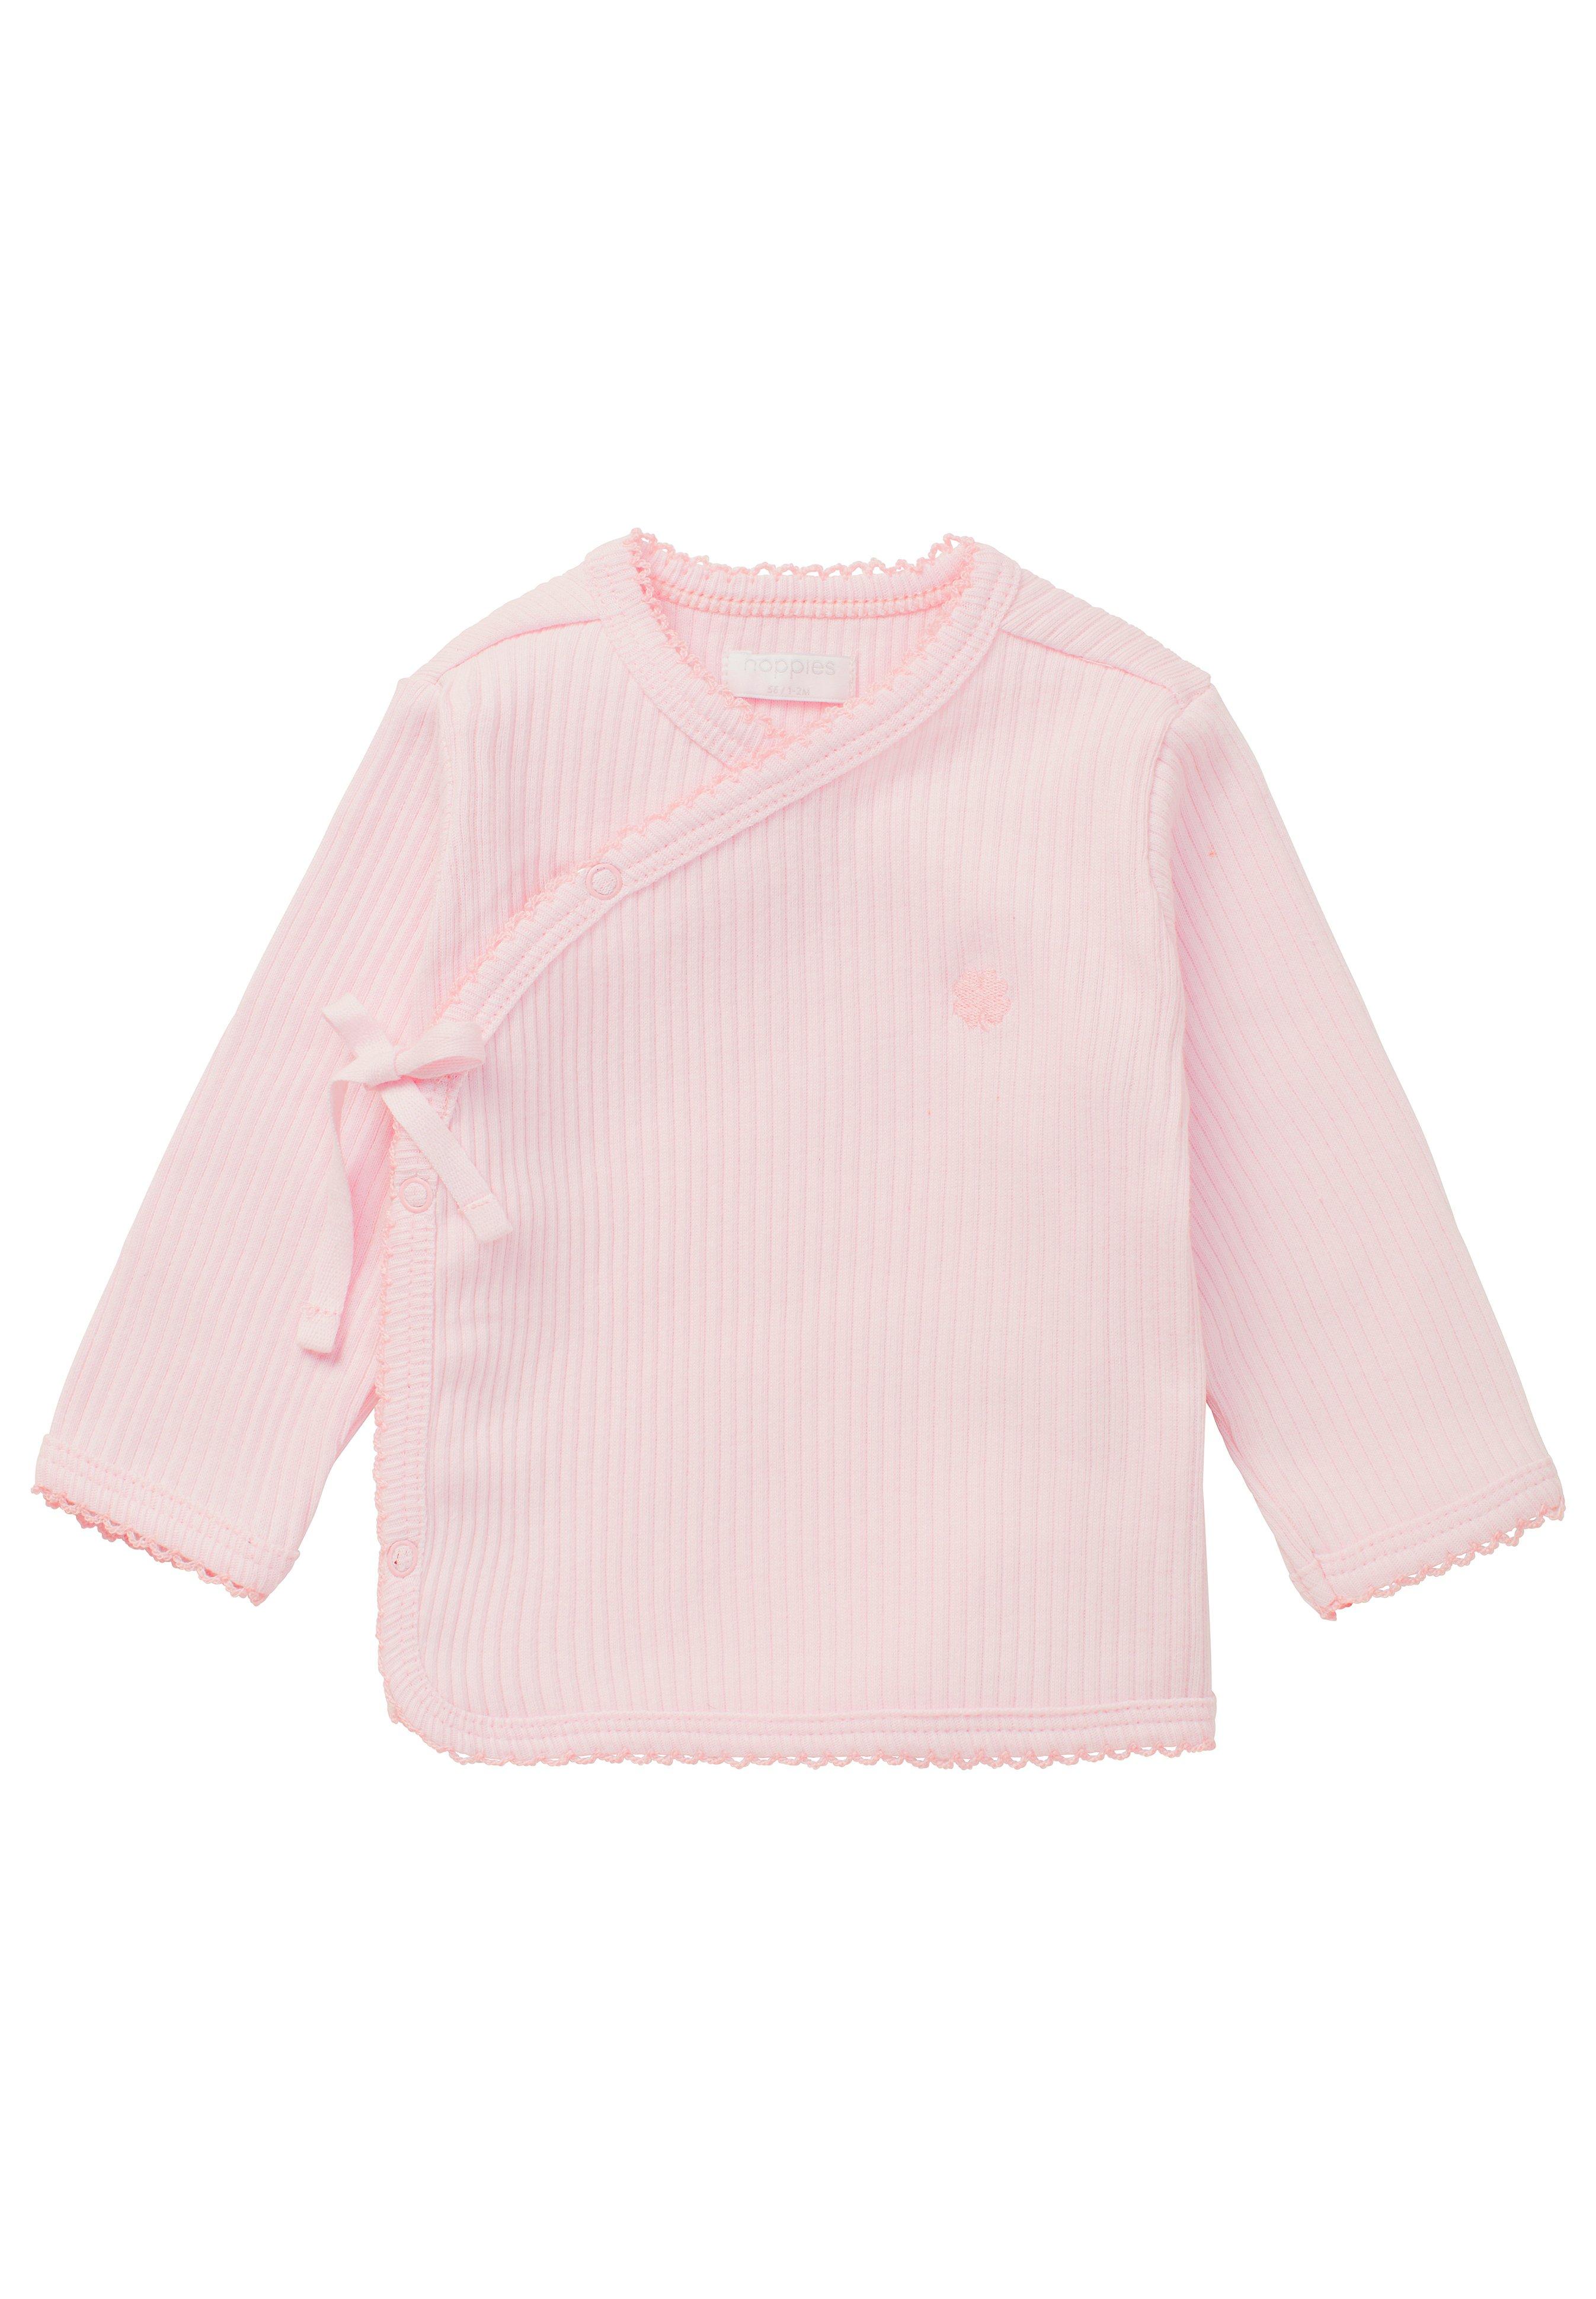 Kinder MEADOW LAKE - Button-down blouse - Hemdbluse